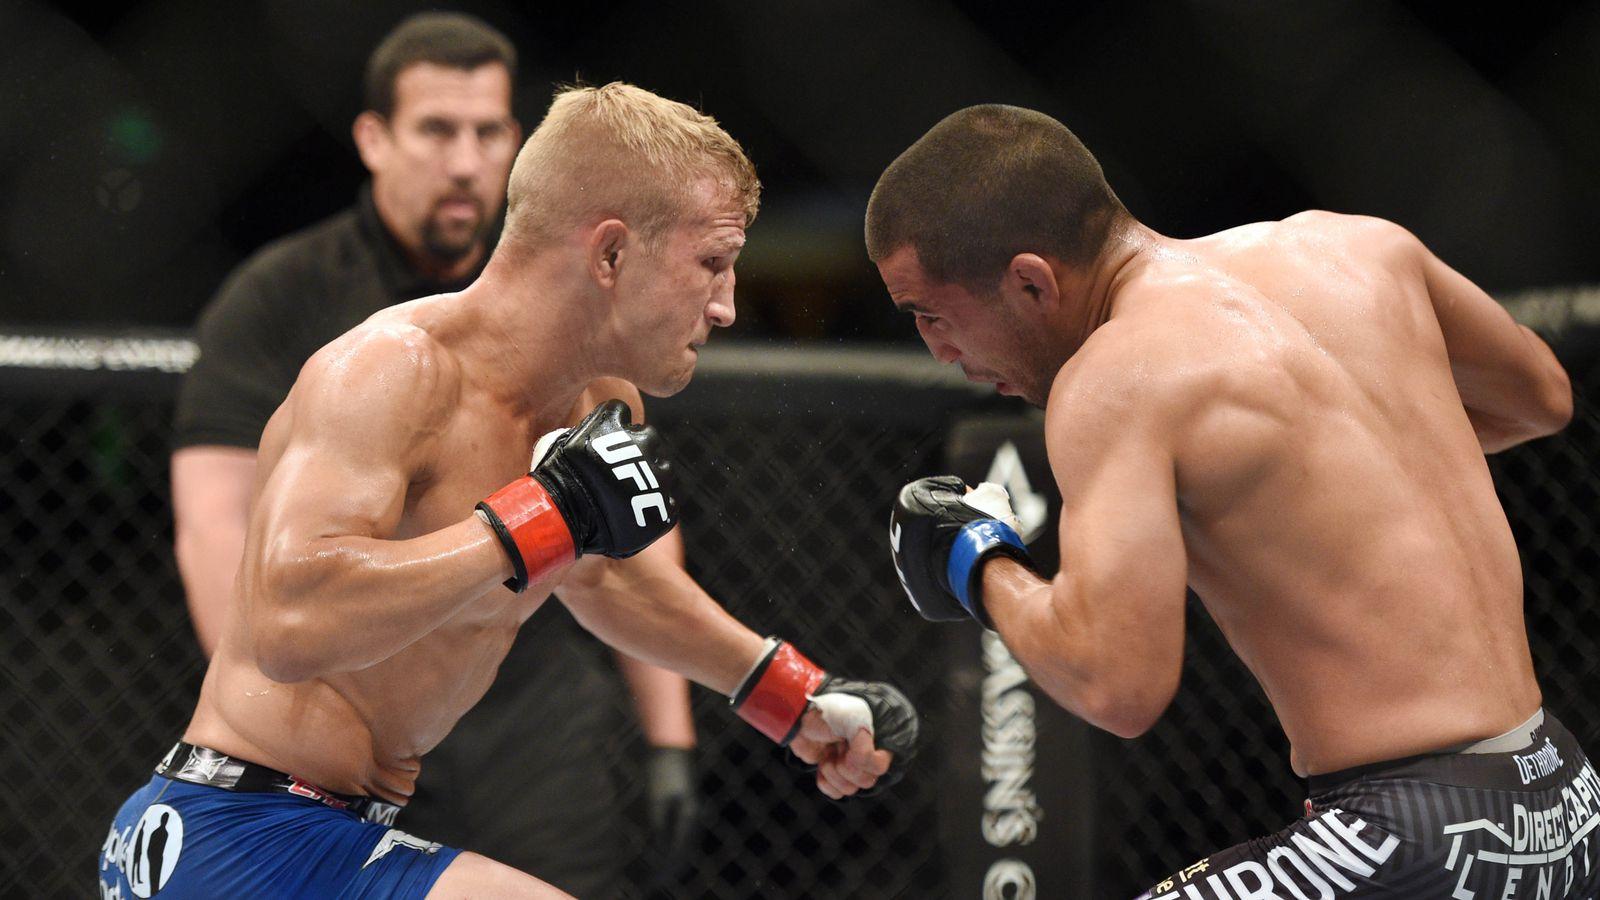 UFC 212: Max Holloway Octagon Interview | UFC ® - Media  |Ufc